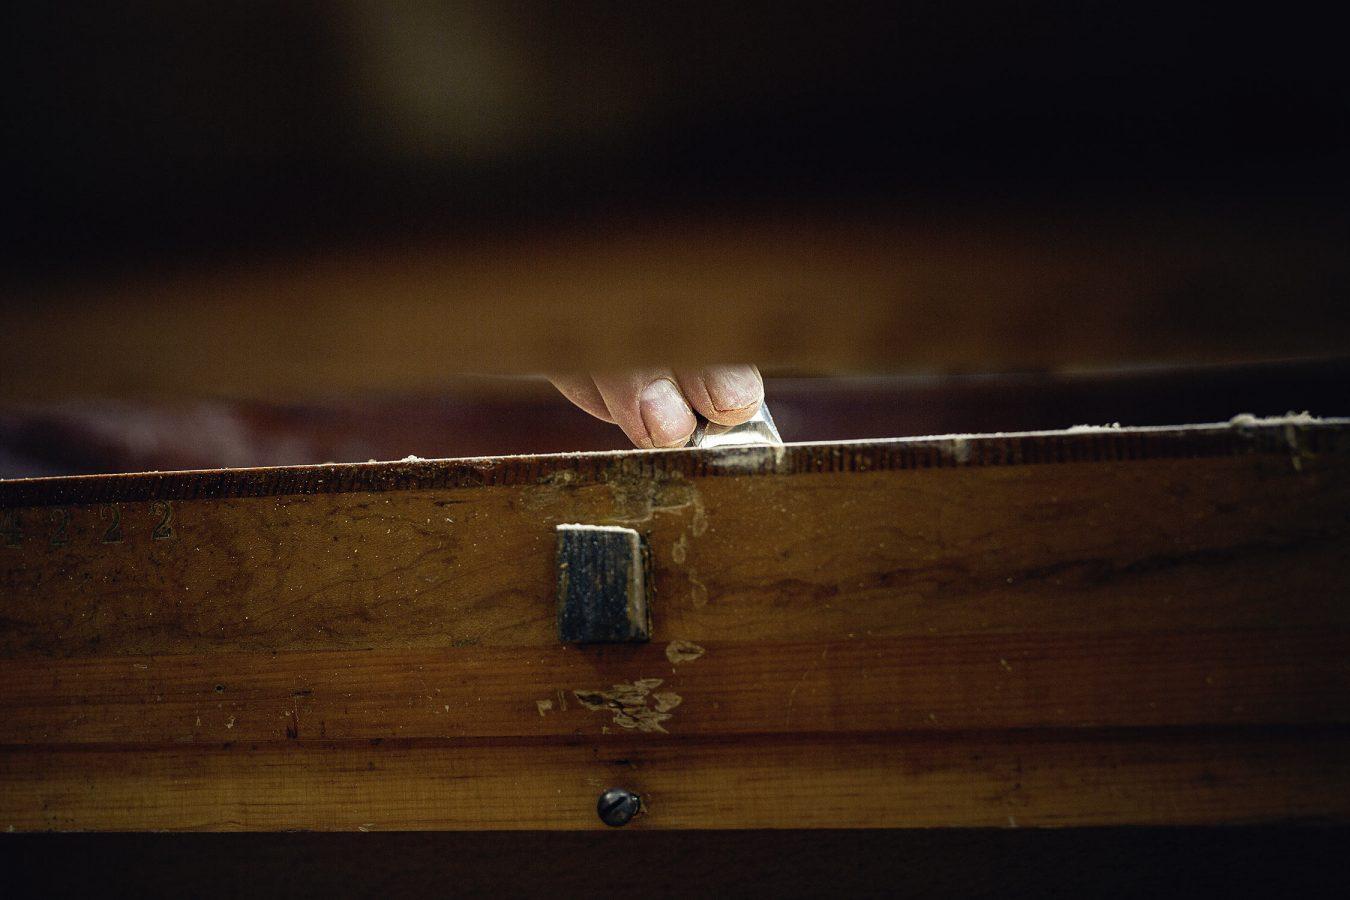 piano-carpentry-editorial-photography-cambridge